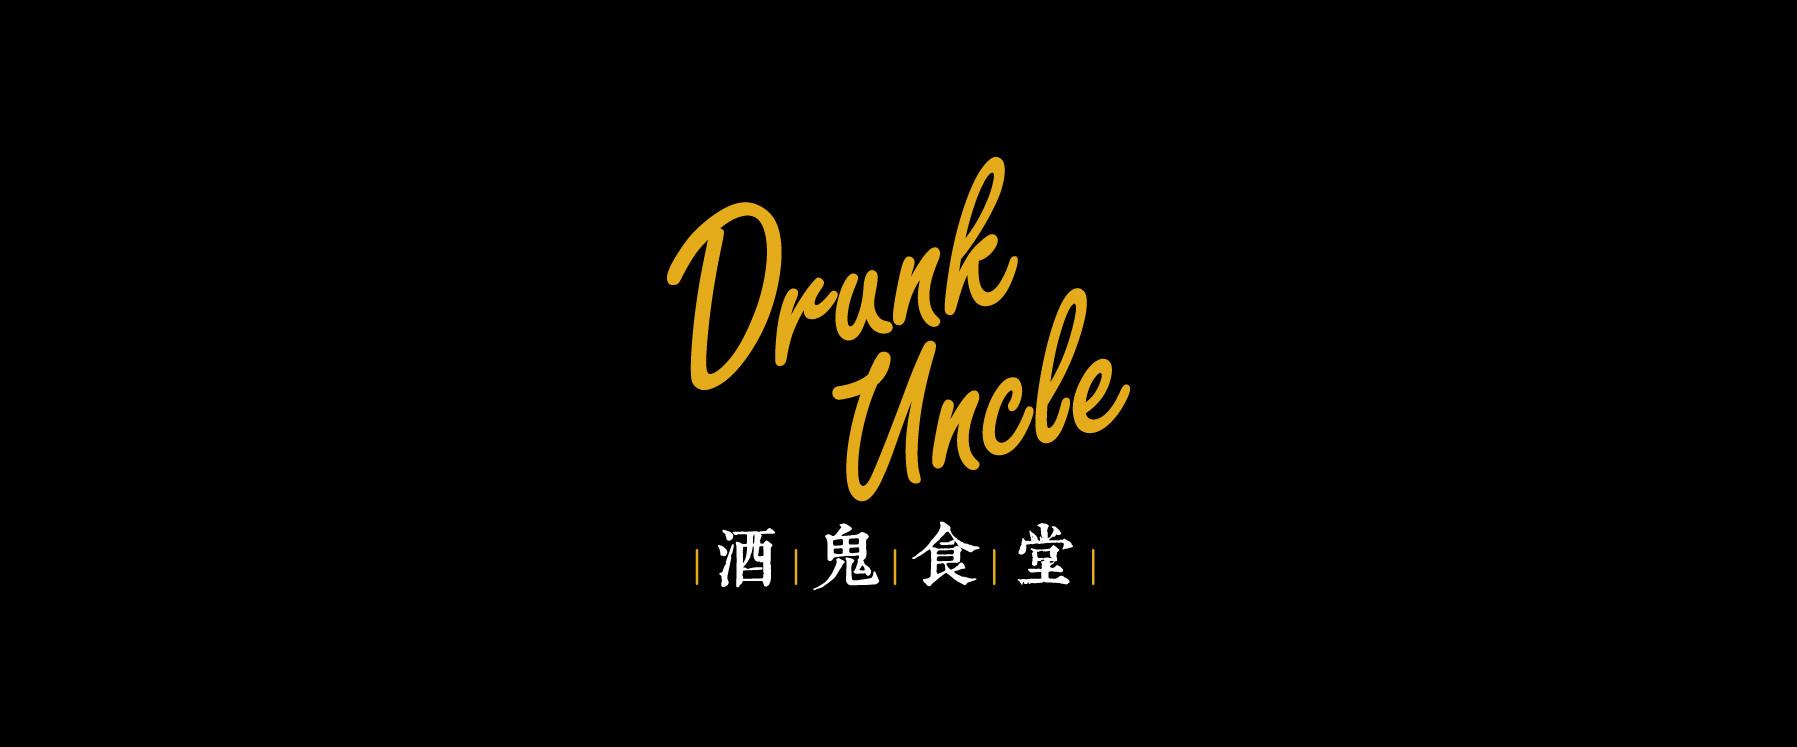 酒鬼食堂Drunk Uncle